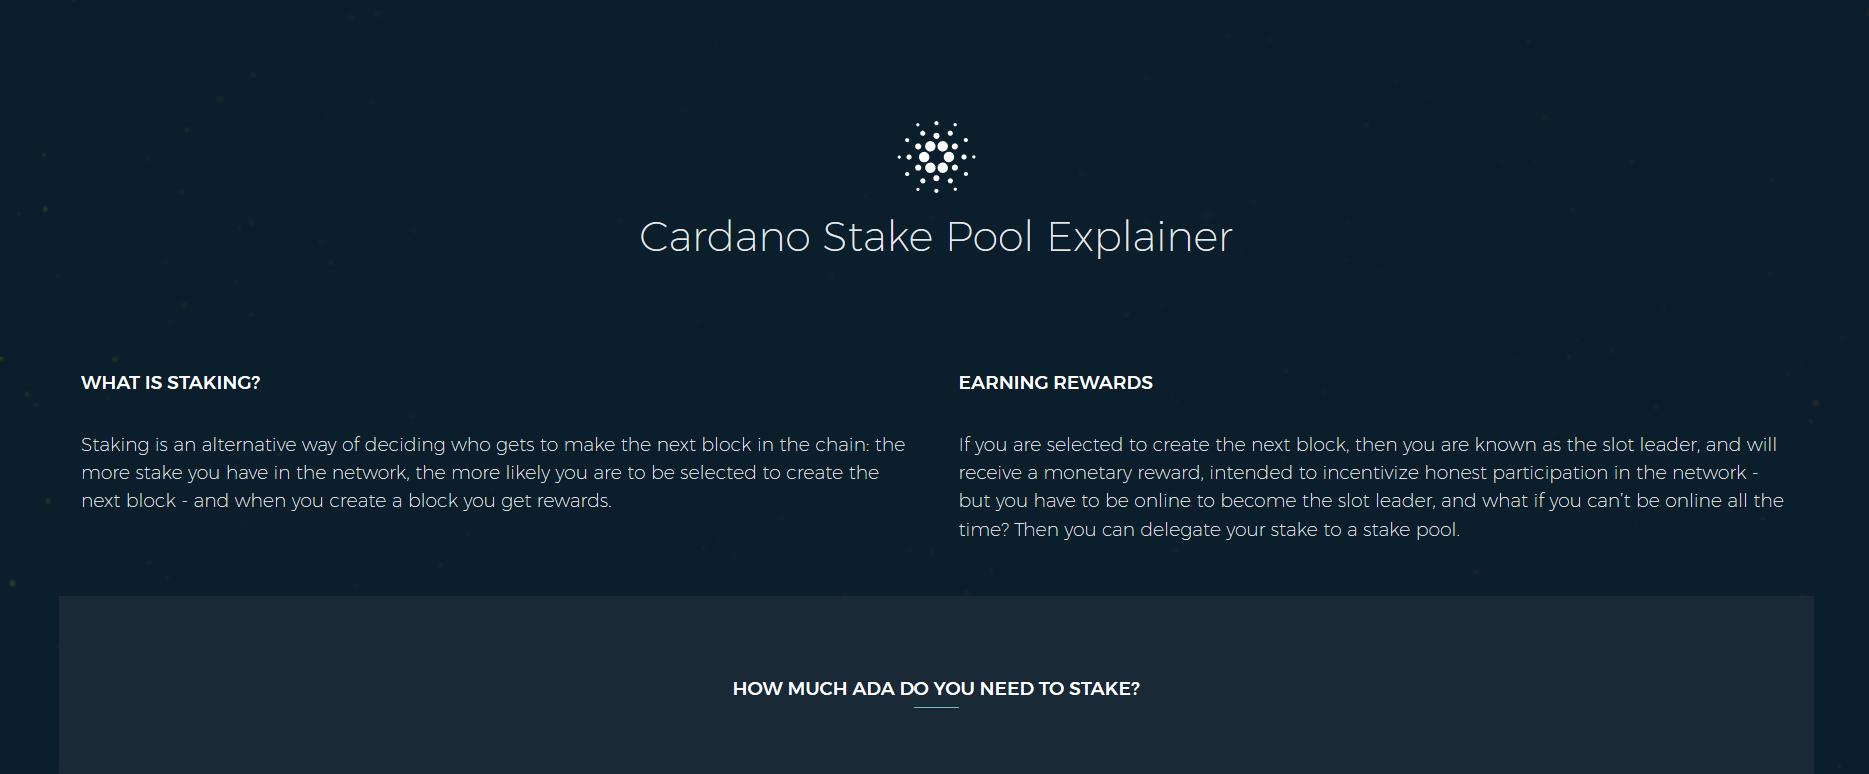 Cardano Stake Pool Explainer